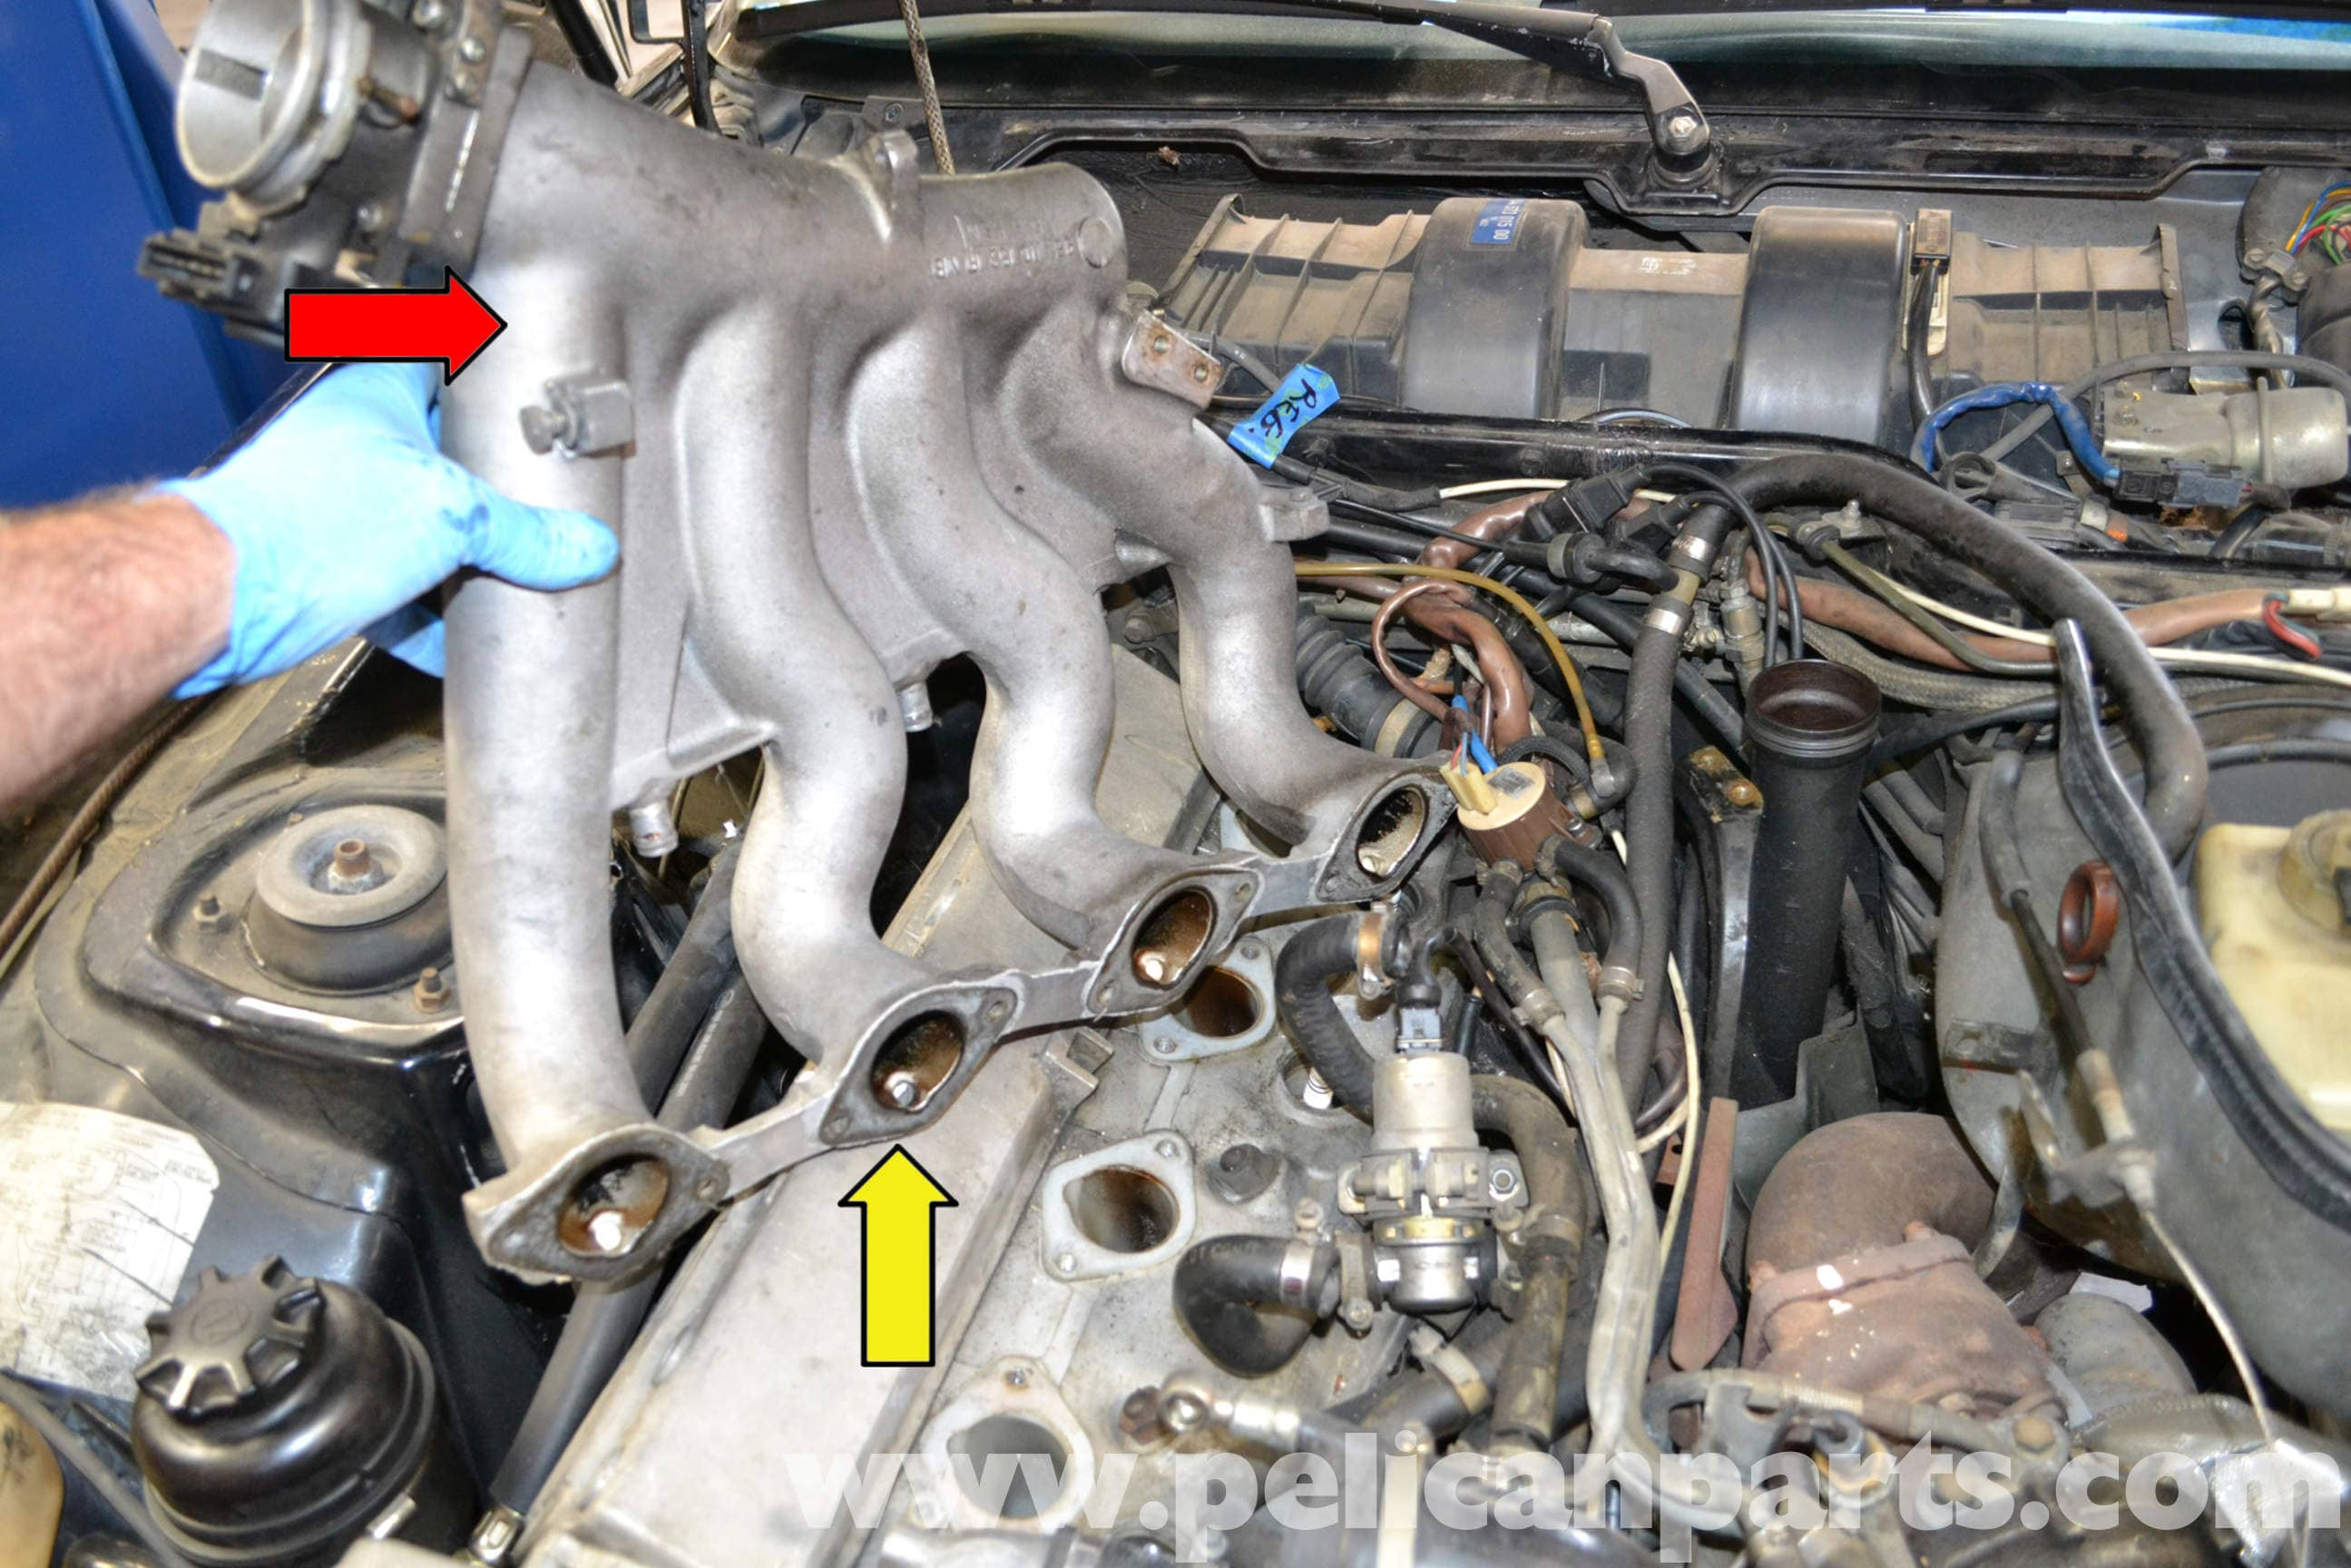 Porsche Engine Diagrams Diagram Of 1986 944 Turbo Electrical Wiring Intake Download U2022 Mitsubishi Precis